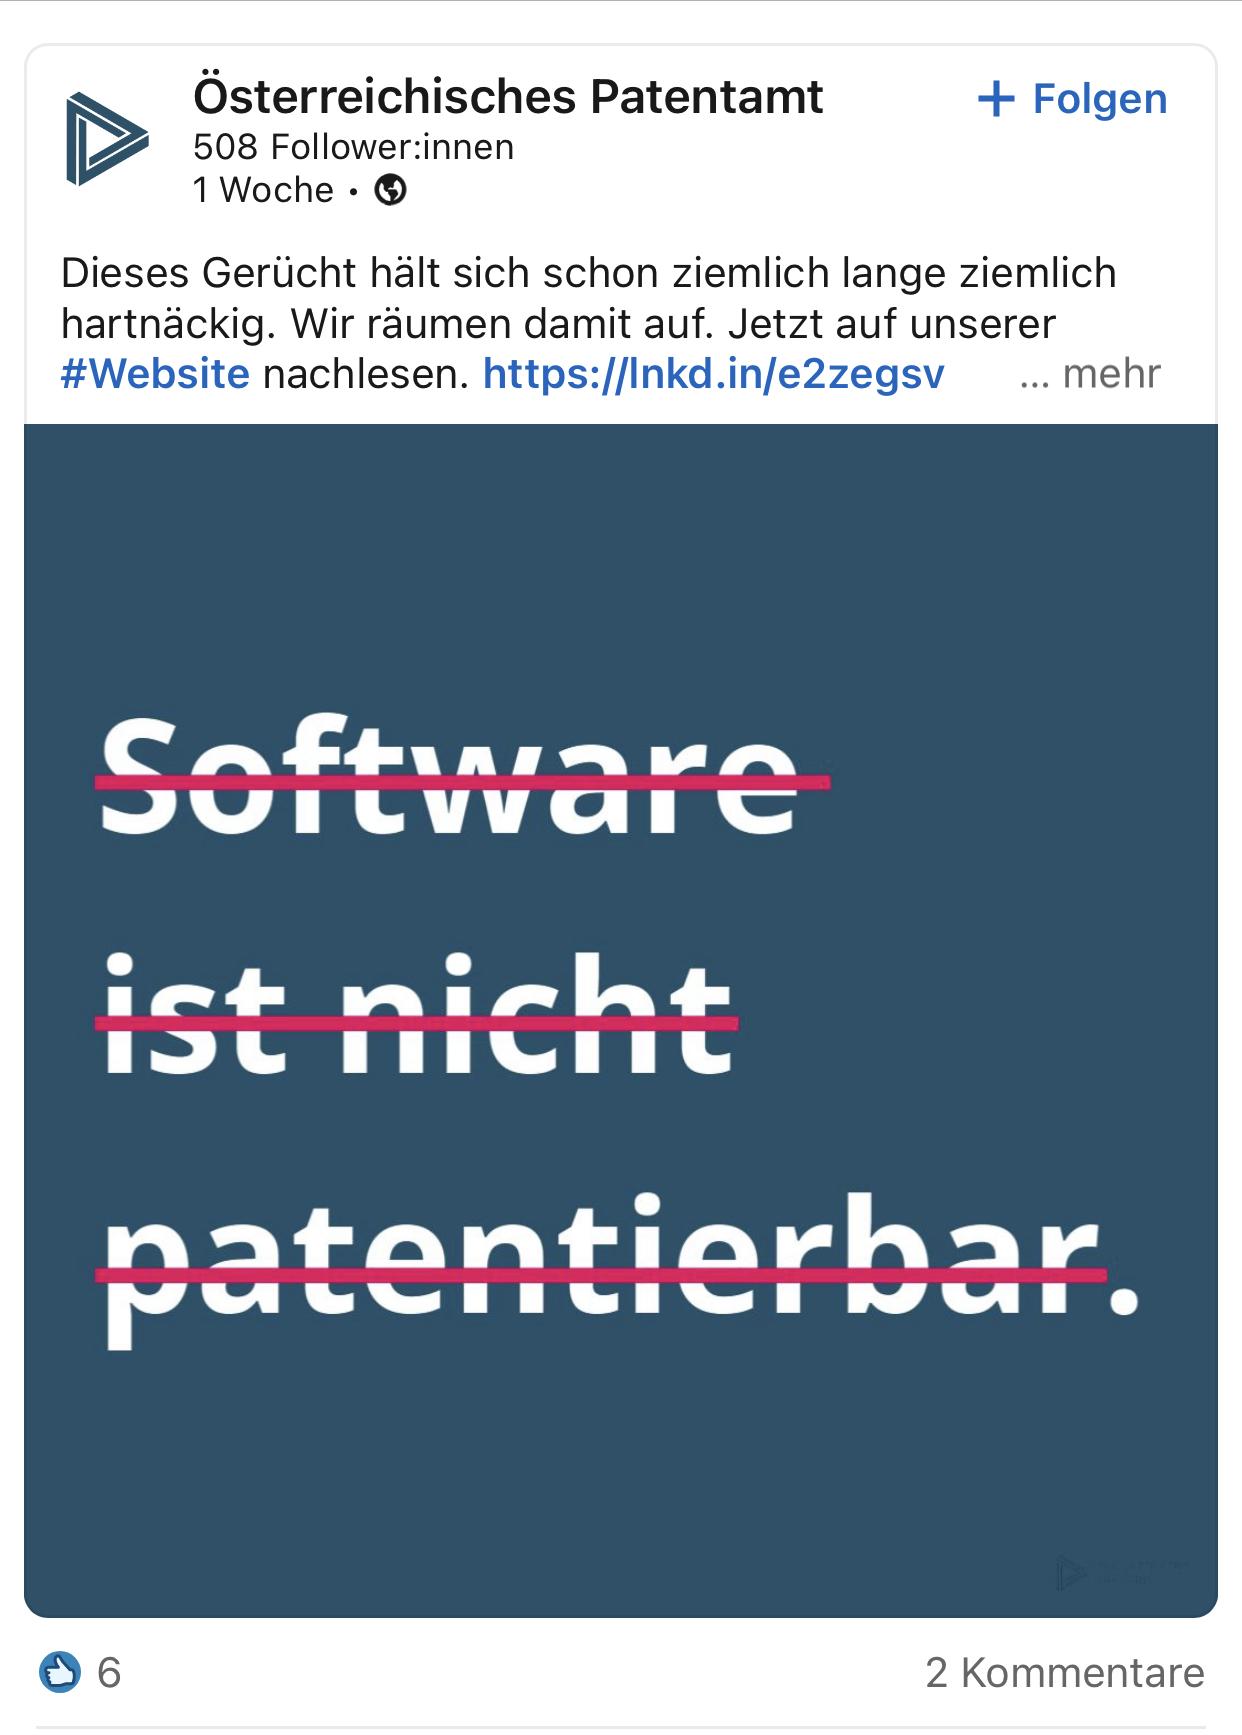 swpat-austrian-patent-office